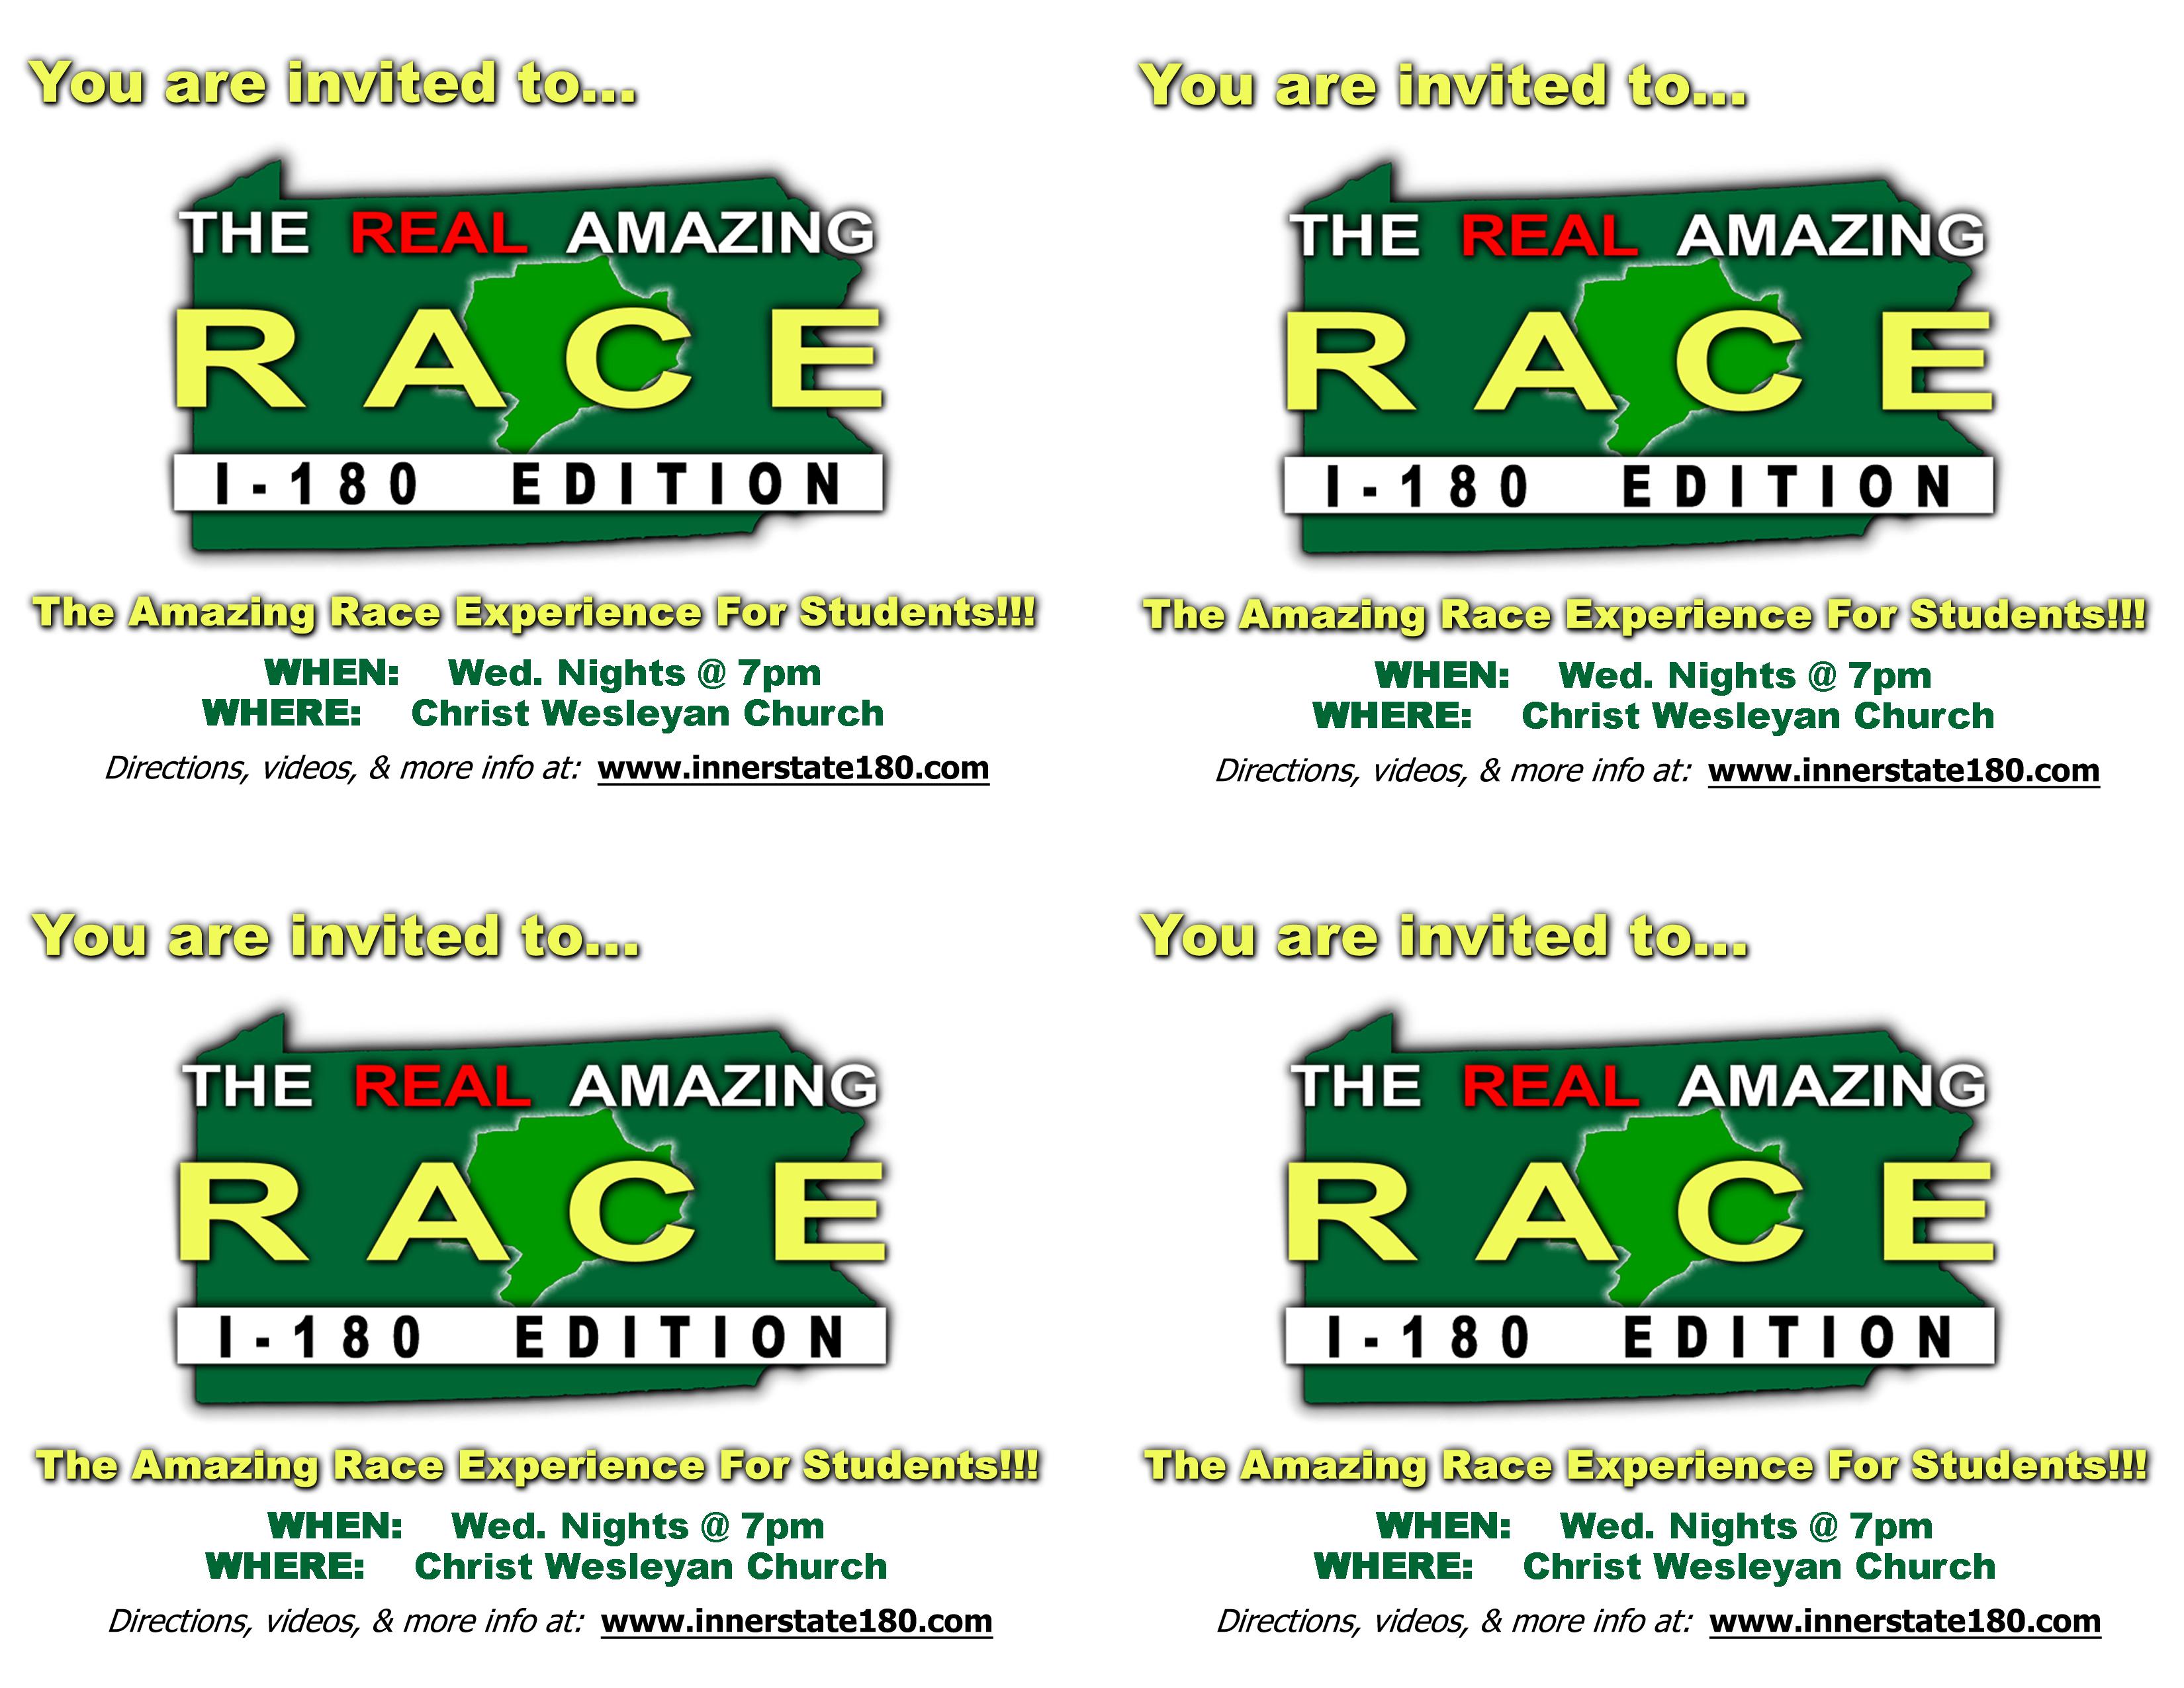 Amazing race birthday invitations party invitations ideas for Amazing race birthday party templates